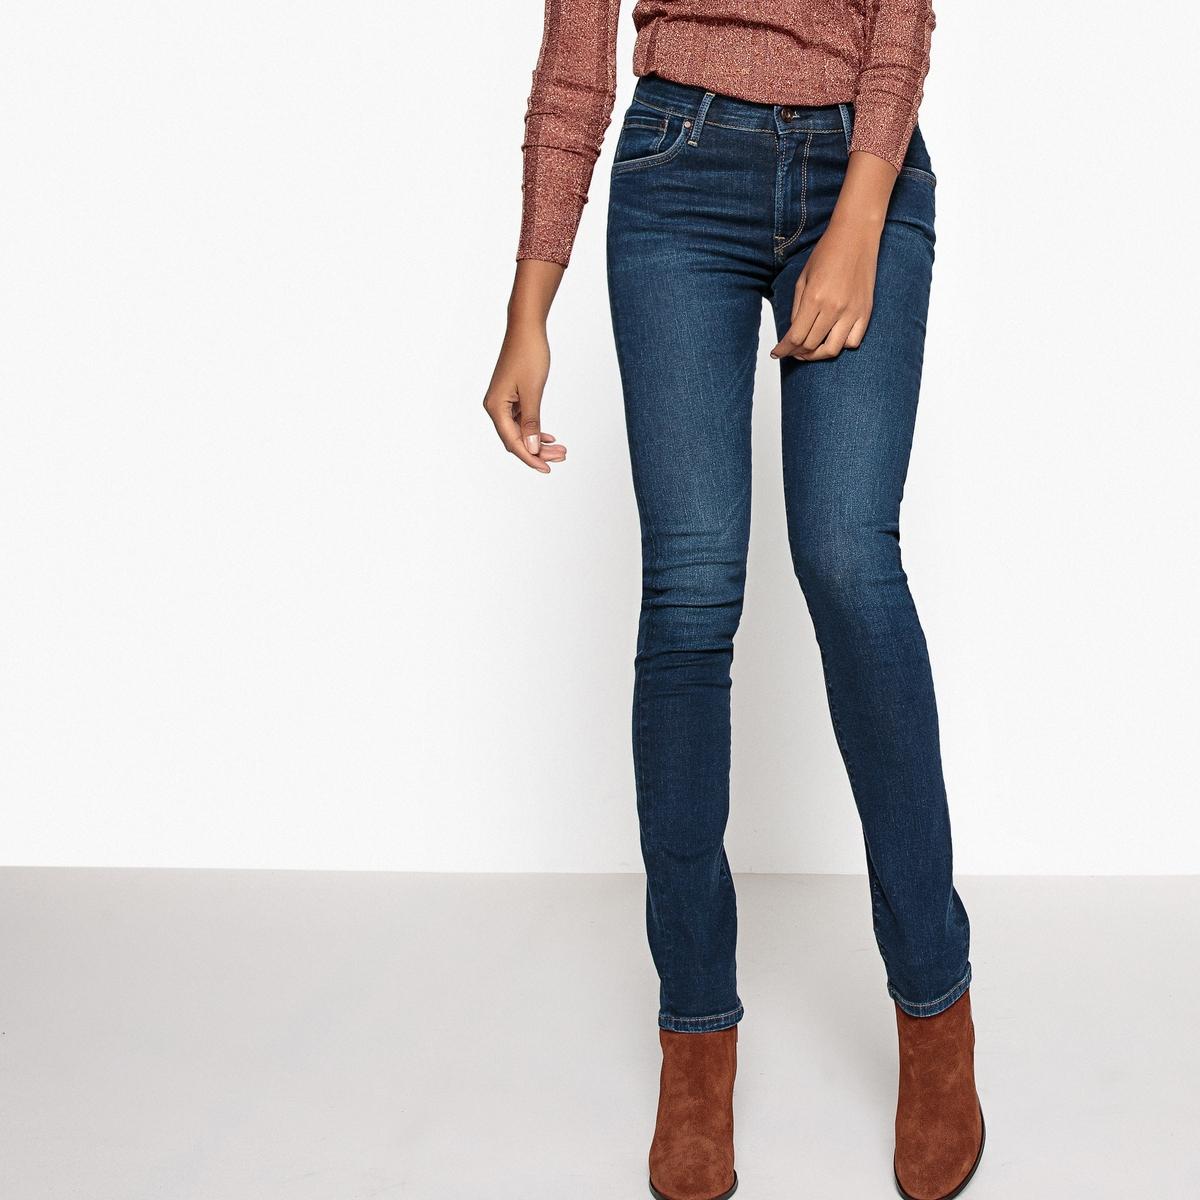 Imagen secundaria de producto de Vaqueros slim VICTORIA - Pepe Jeans